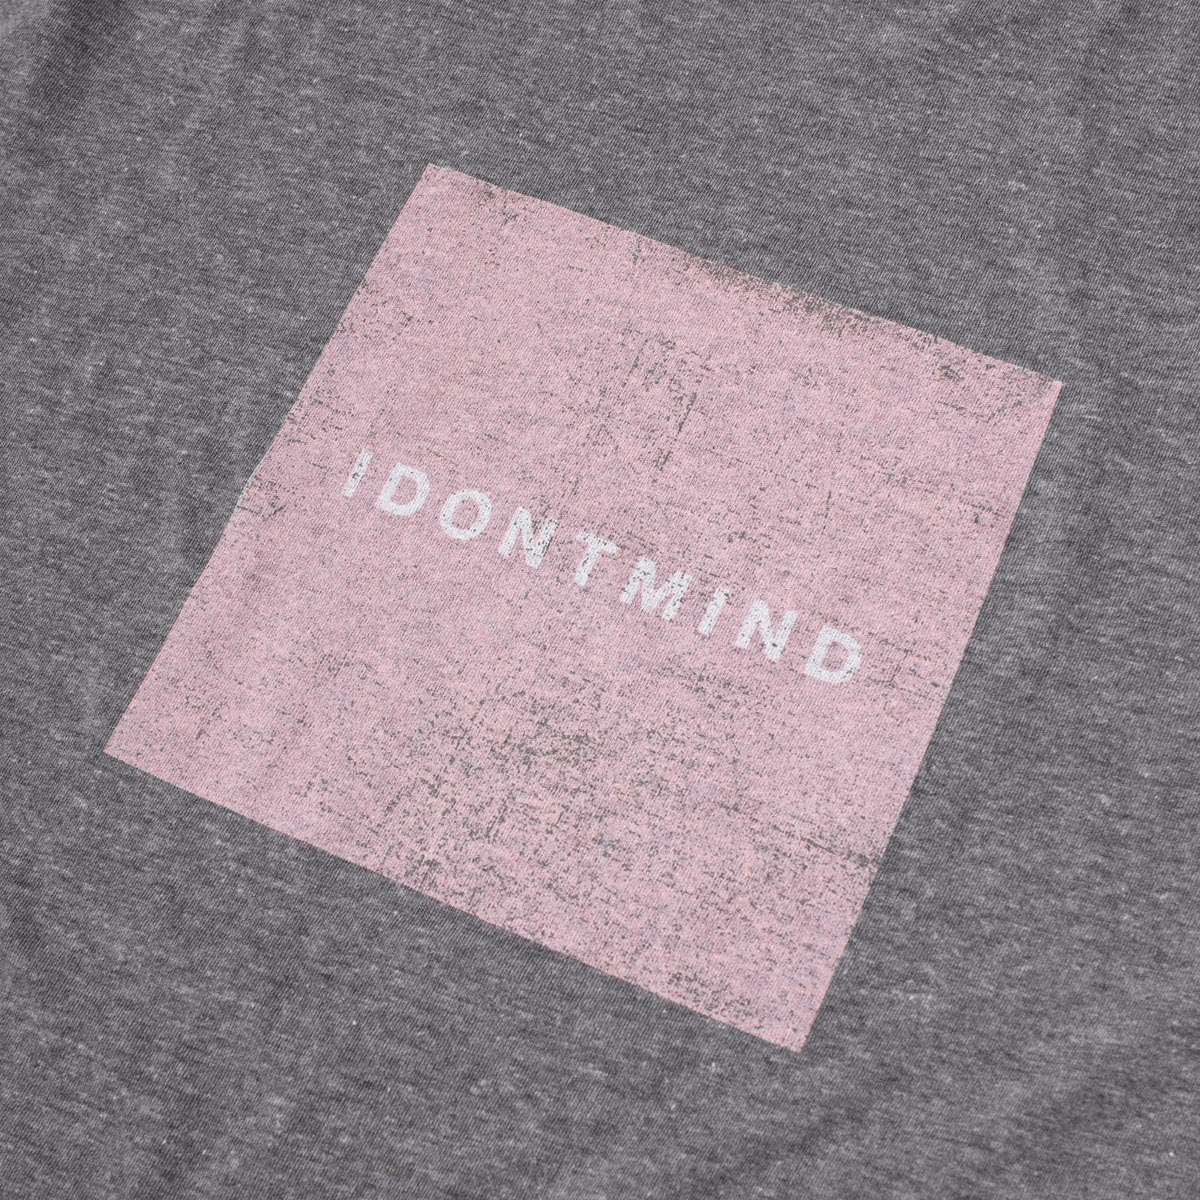 IDONTMIND-Vintage-Square-Tee-Gray-Detail.jpg